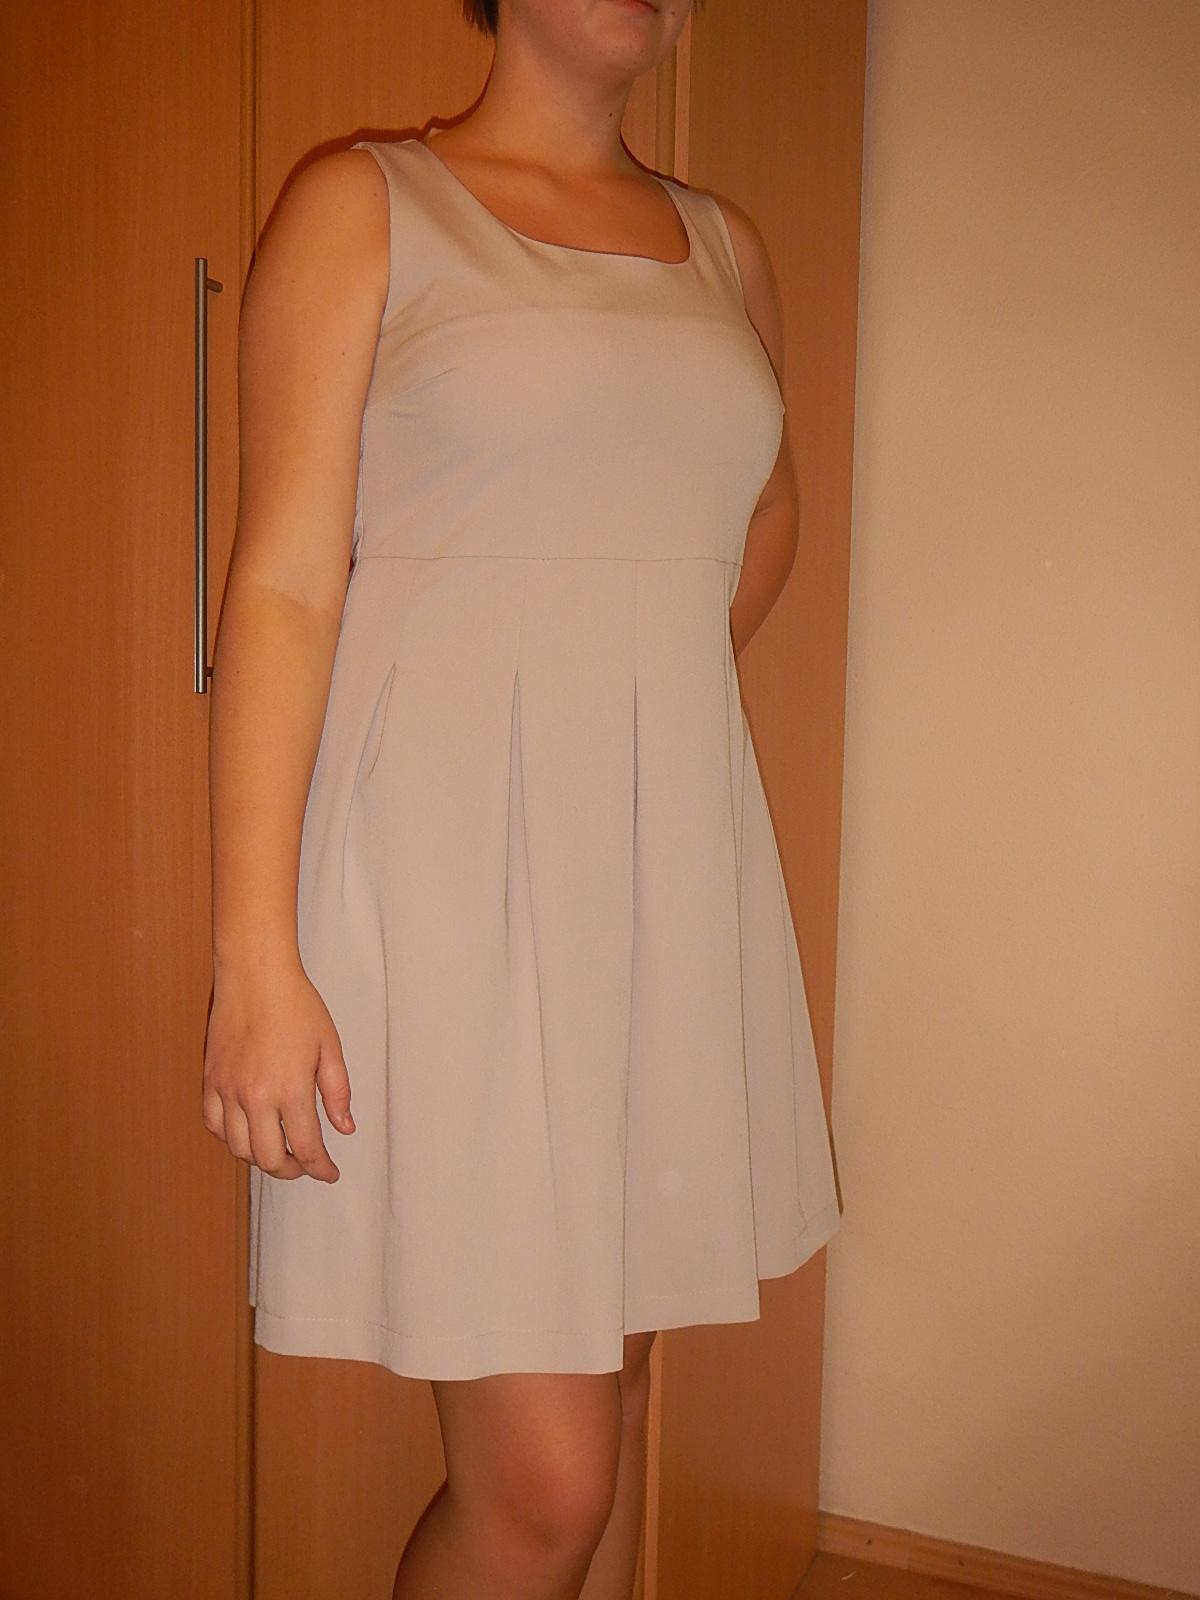 Koktailové šaty - Obrázok č. 1